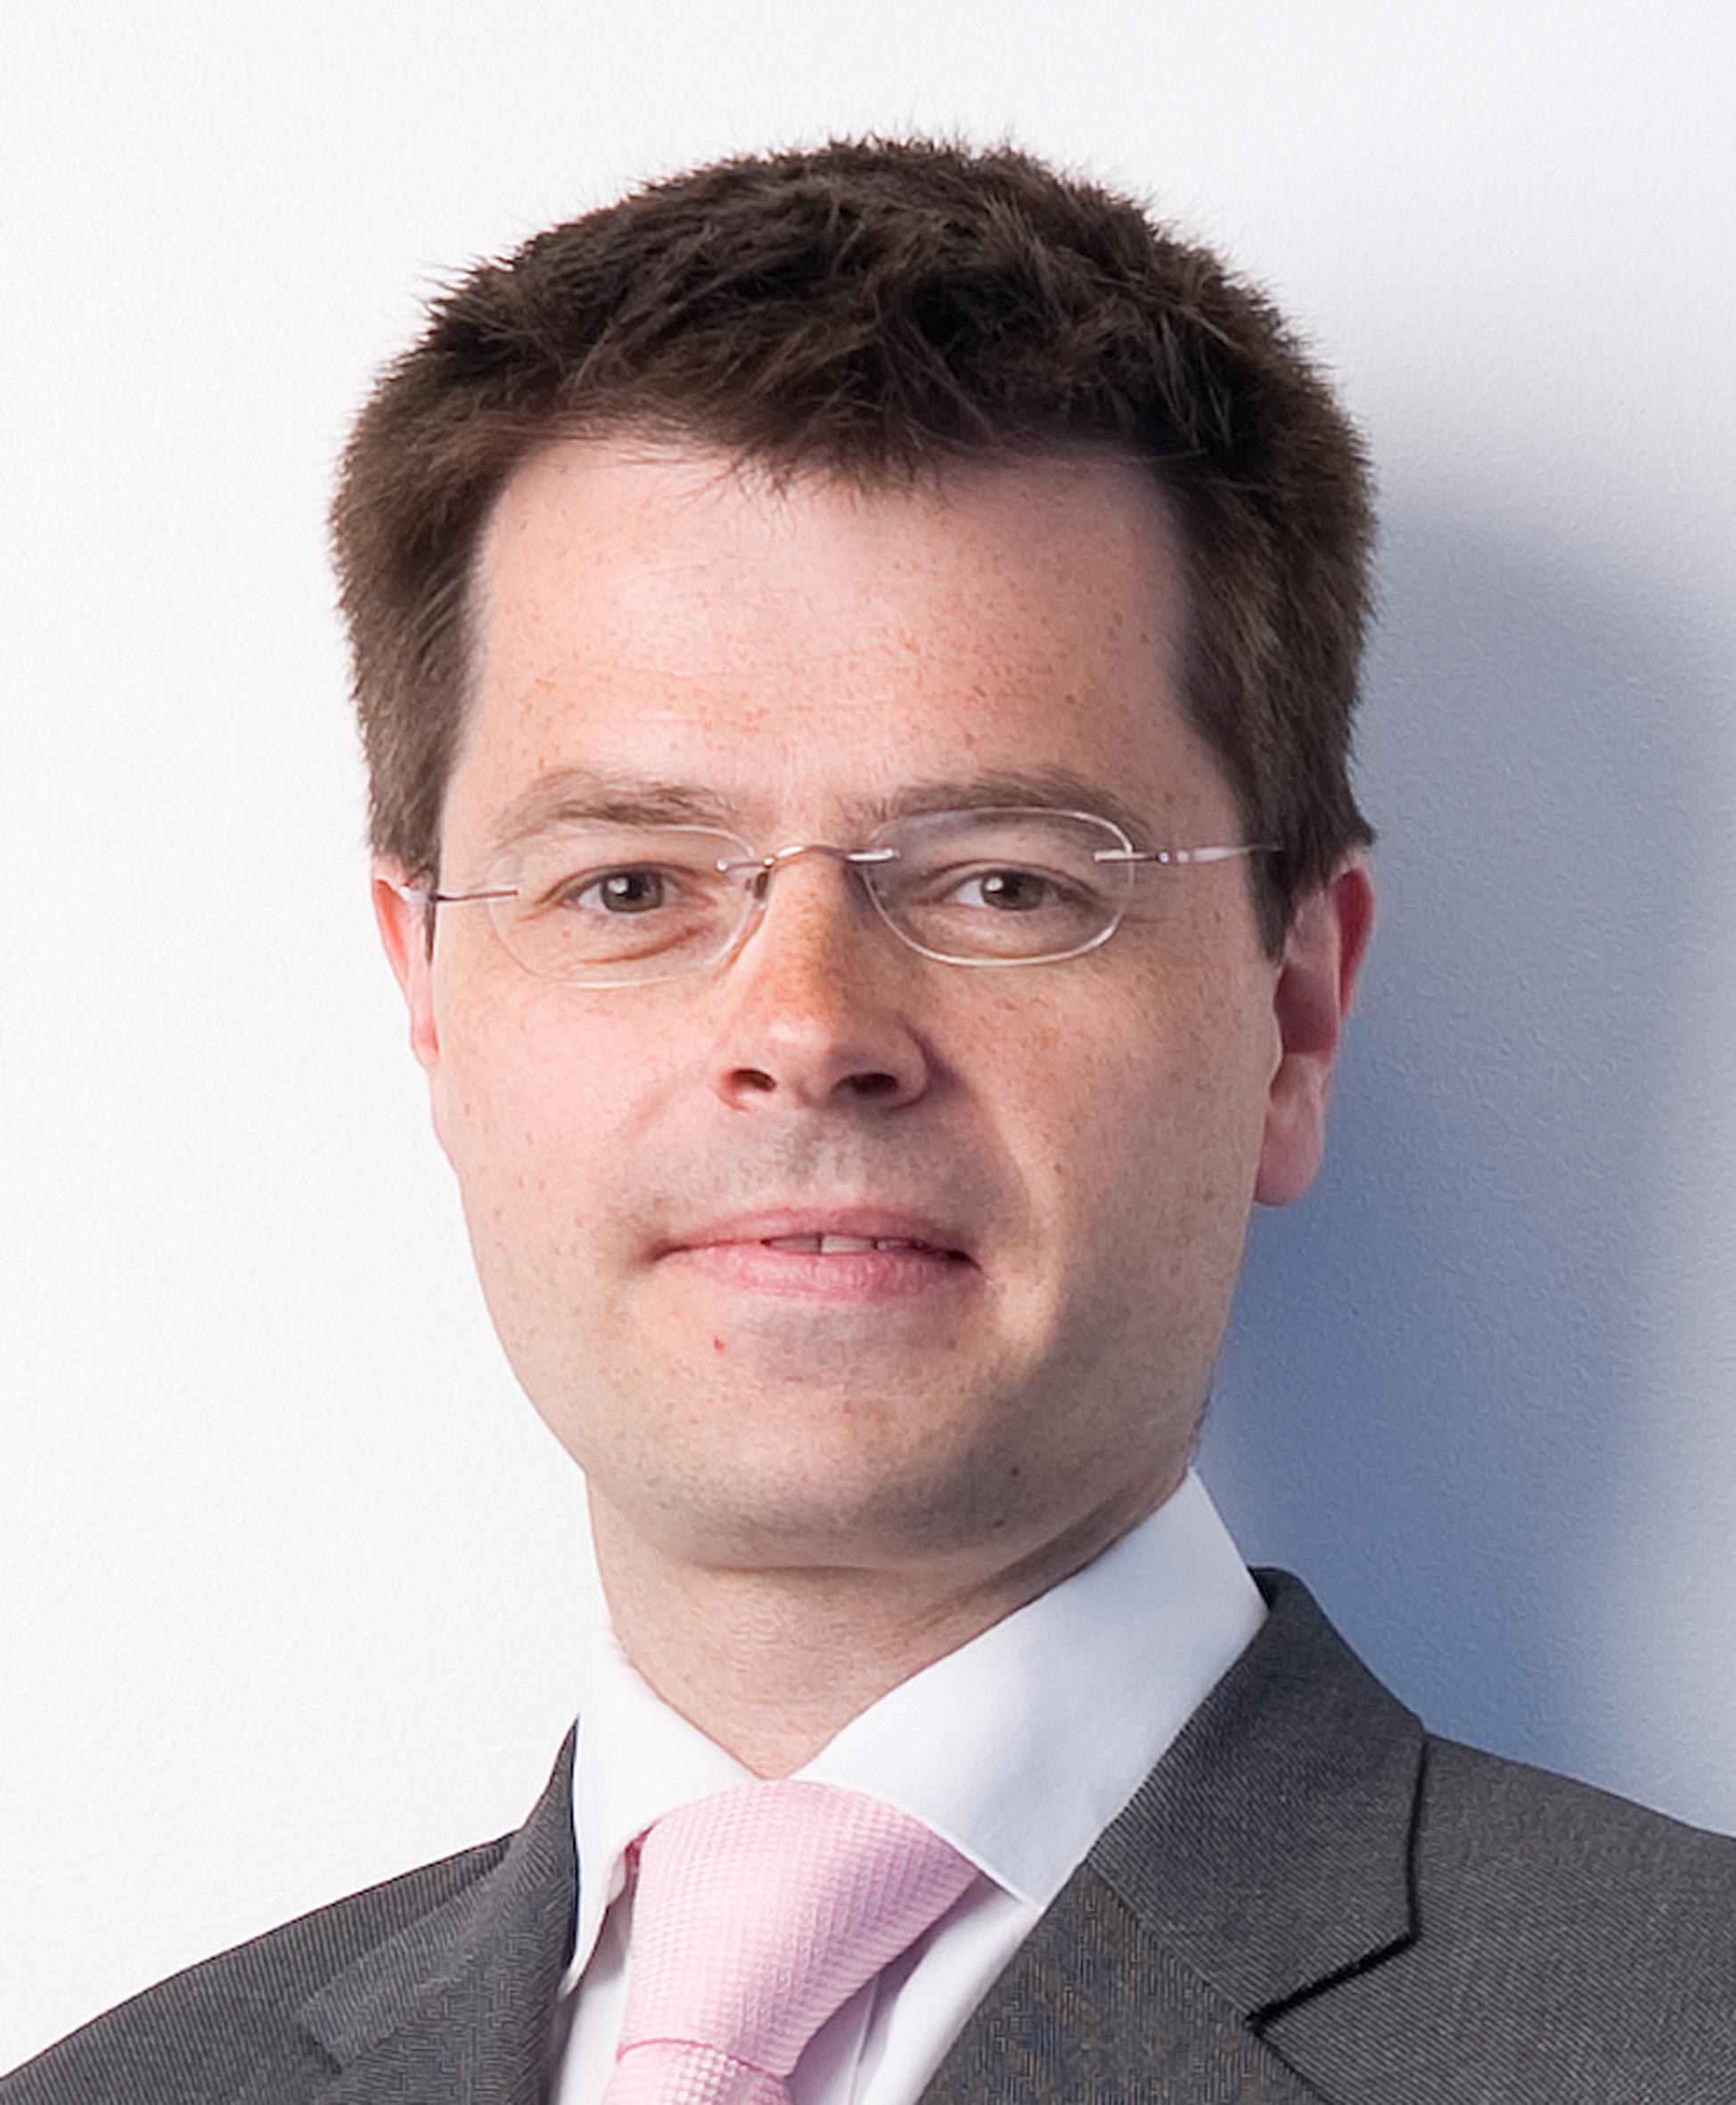 James Brokenshire, the new Northern Ireland secretary